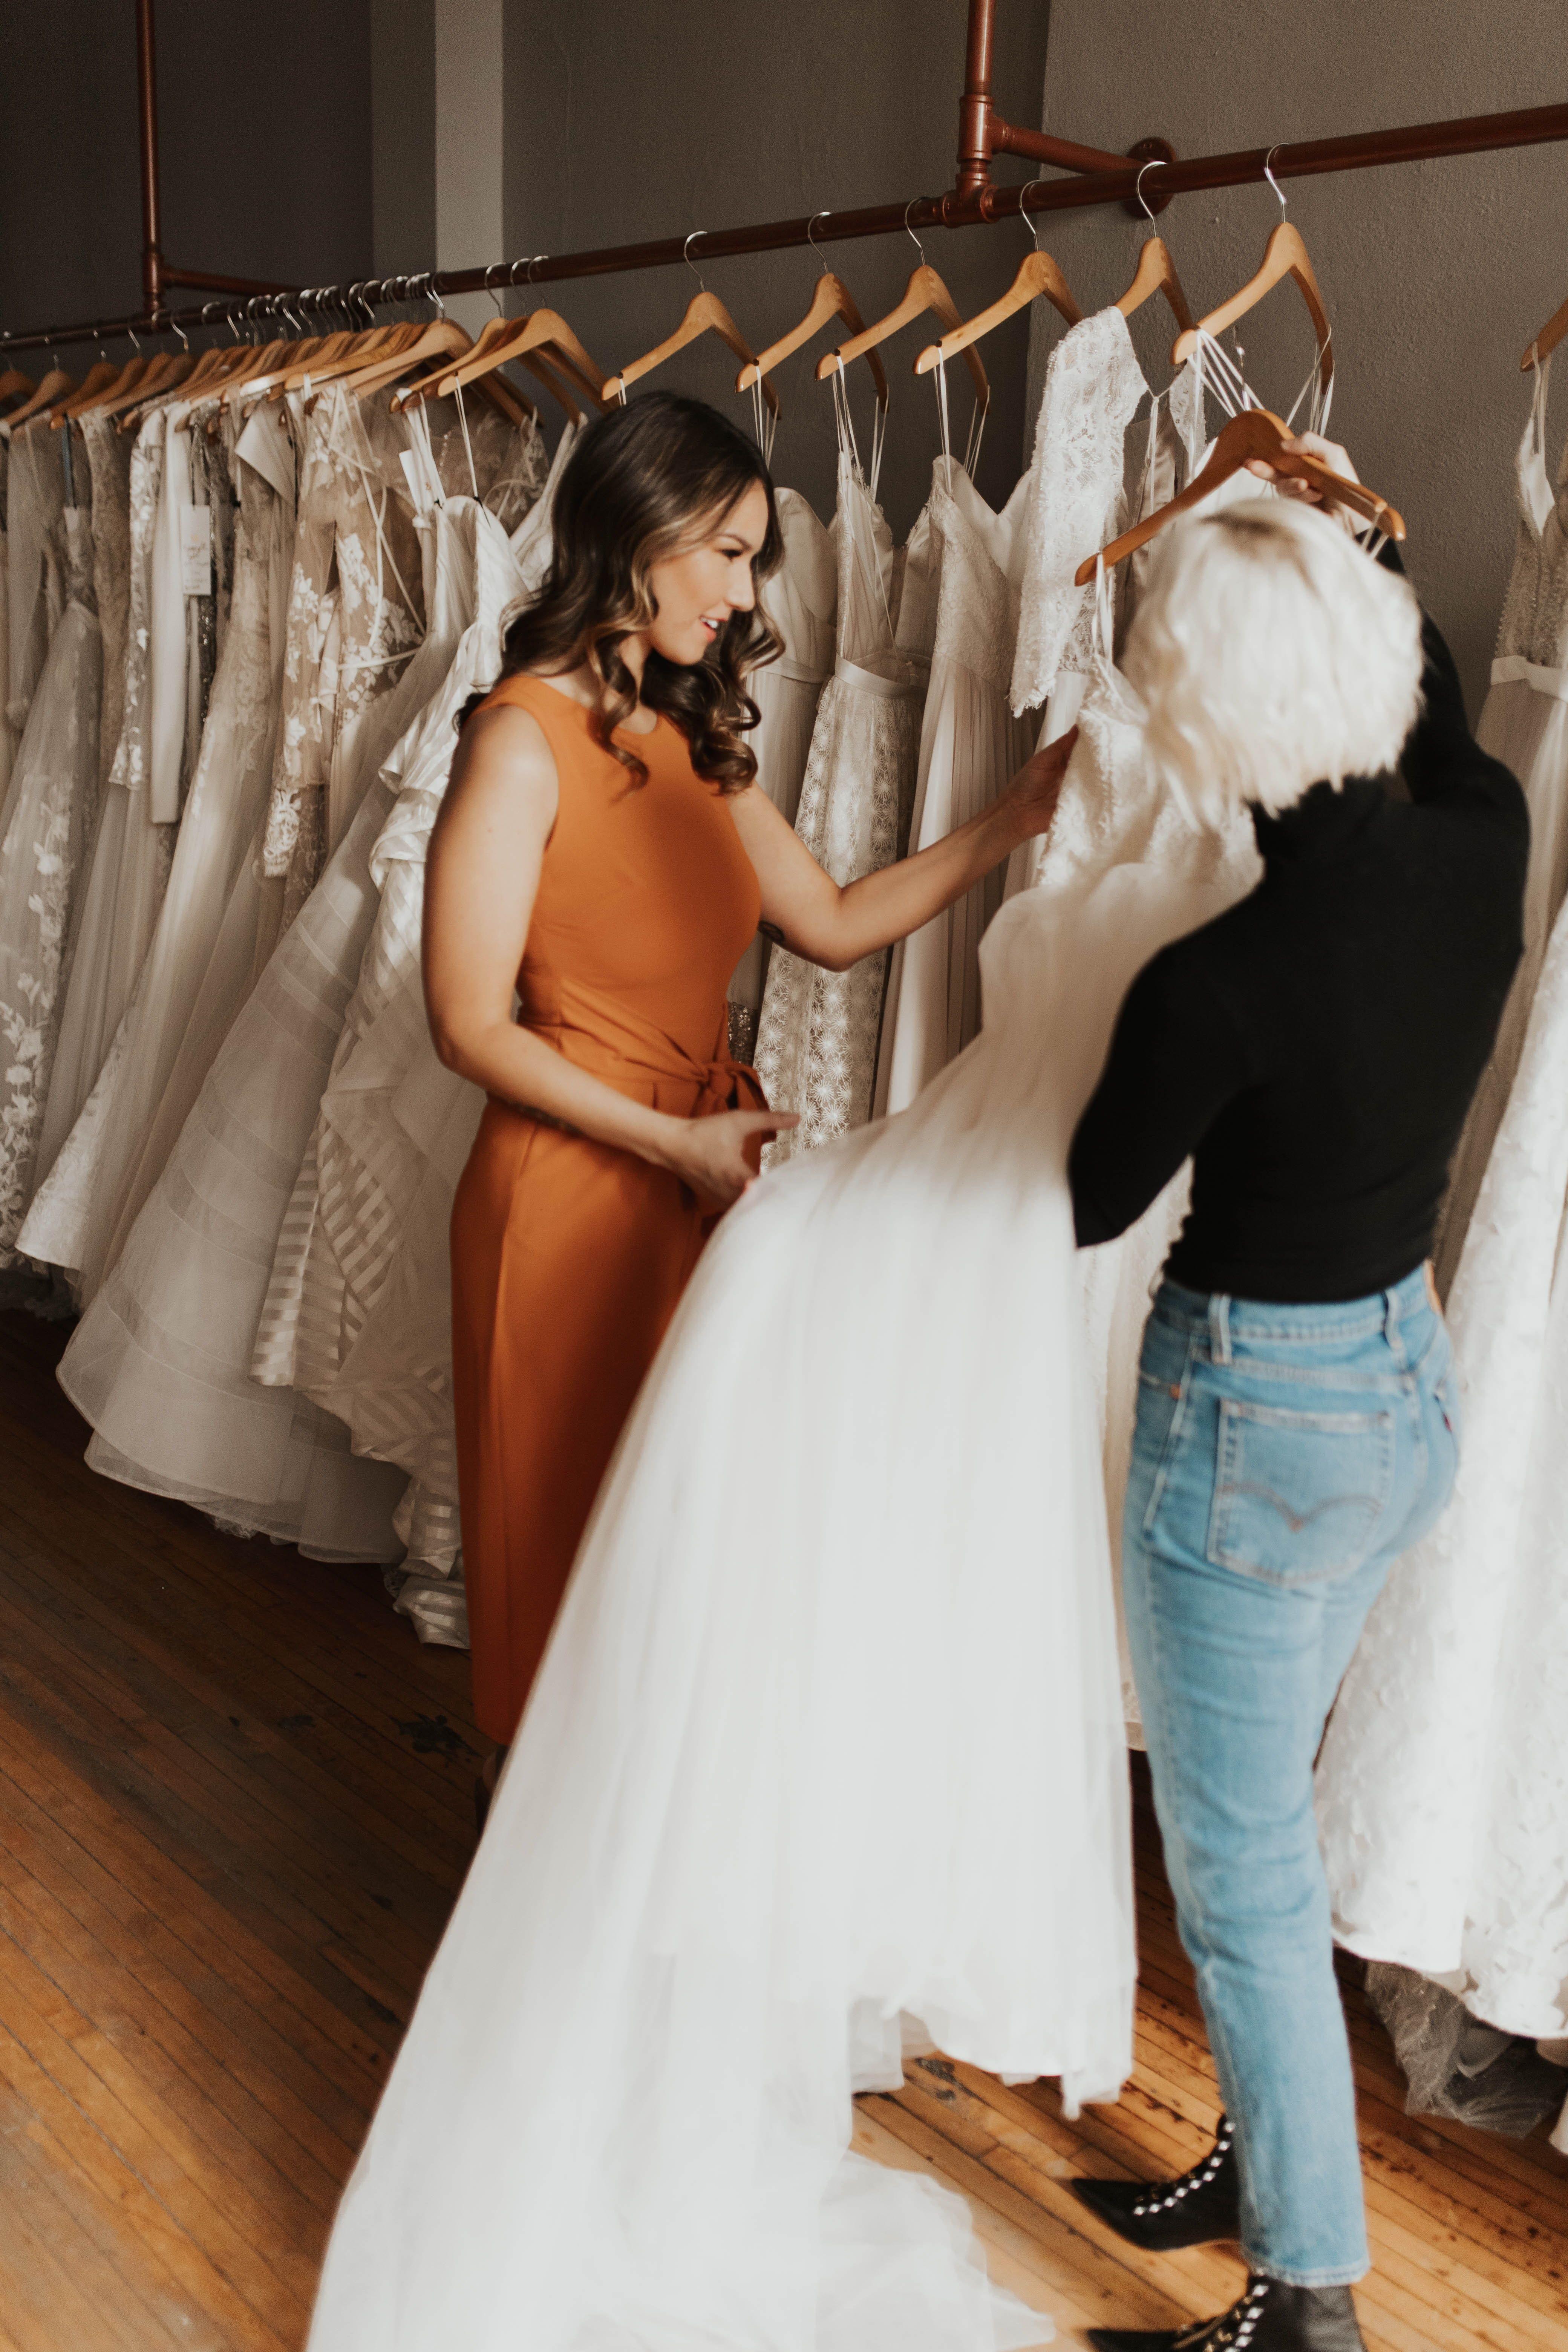 Look Inside A Be Bridal Shop In Minneapolis A Be Bridal Shop Bridal Shop Bridal Shop Interior Bridal,Second Wedding Wedding Dress Mature Bride